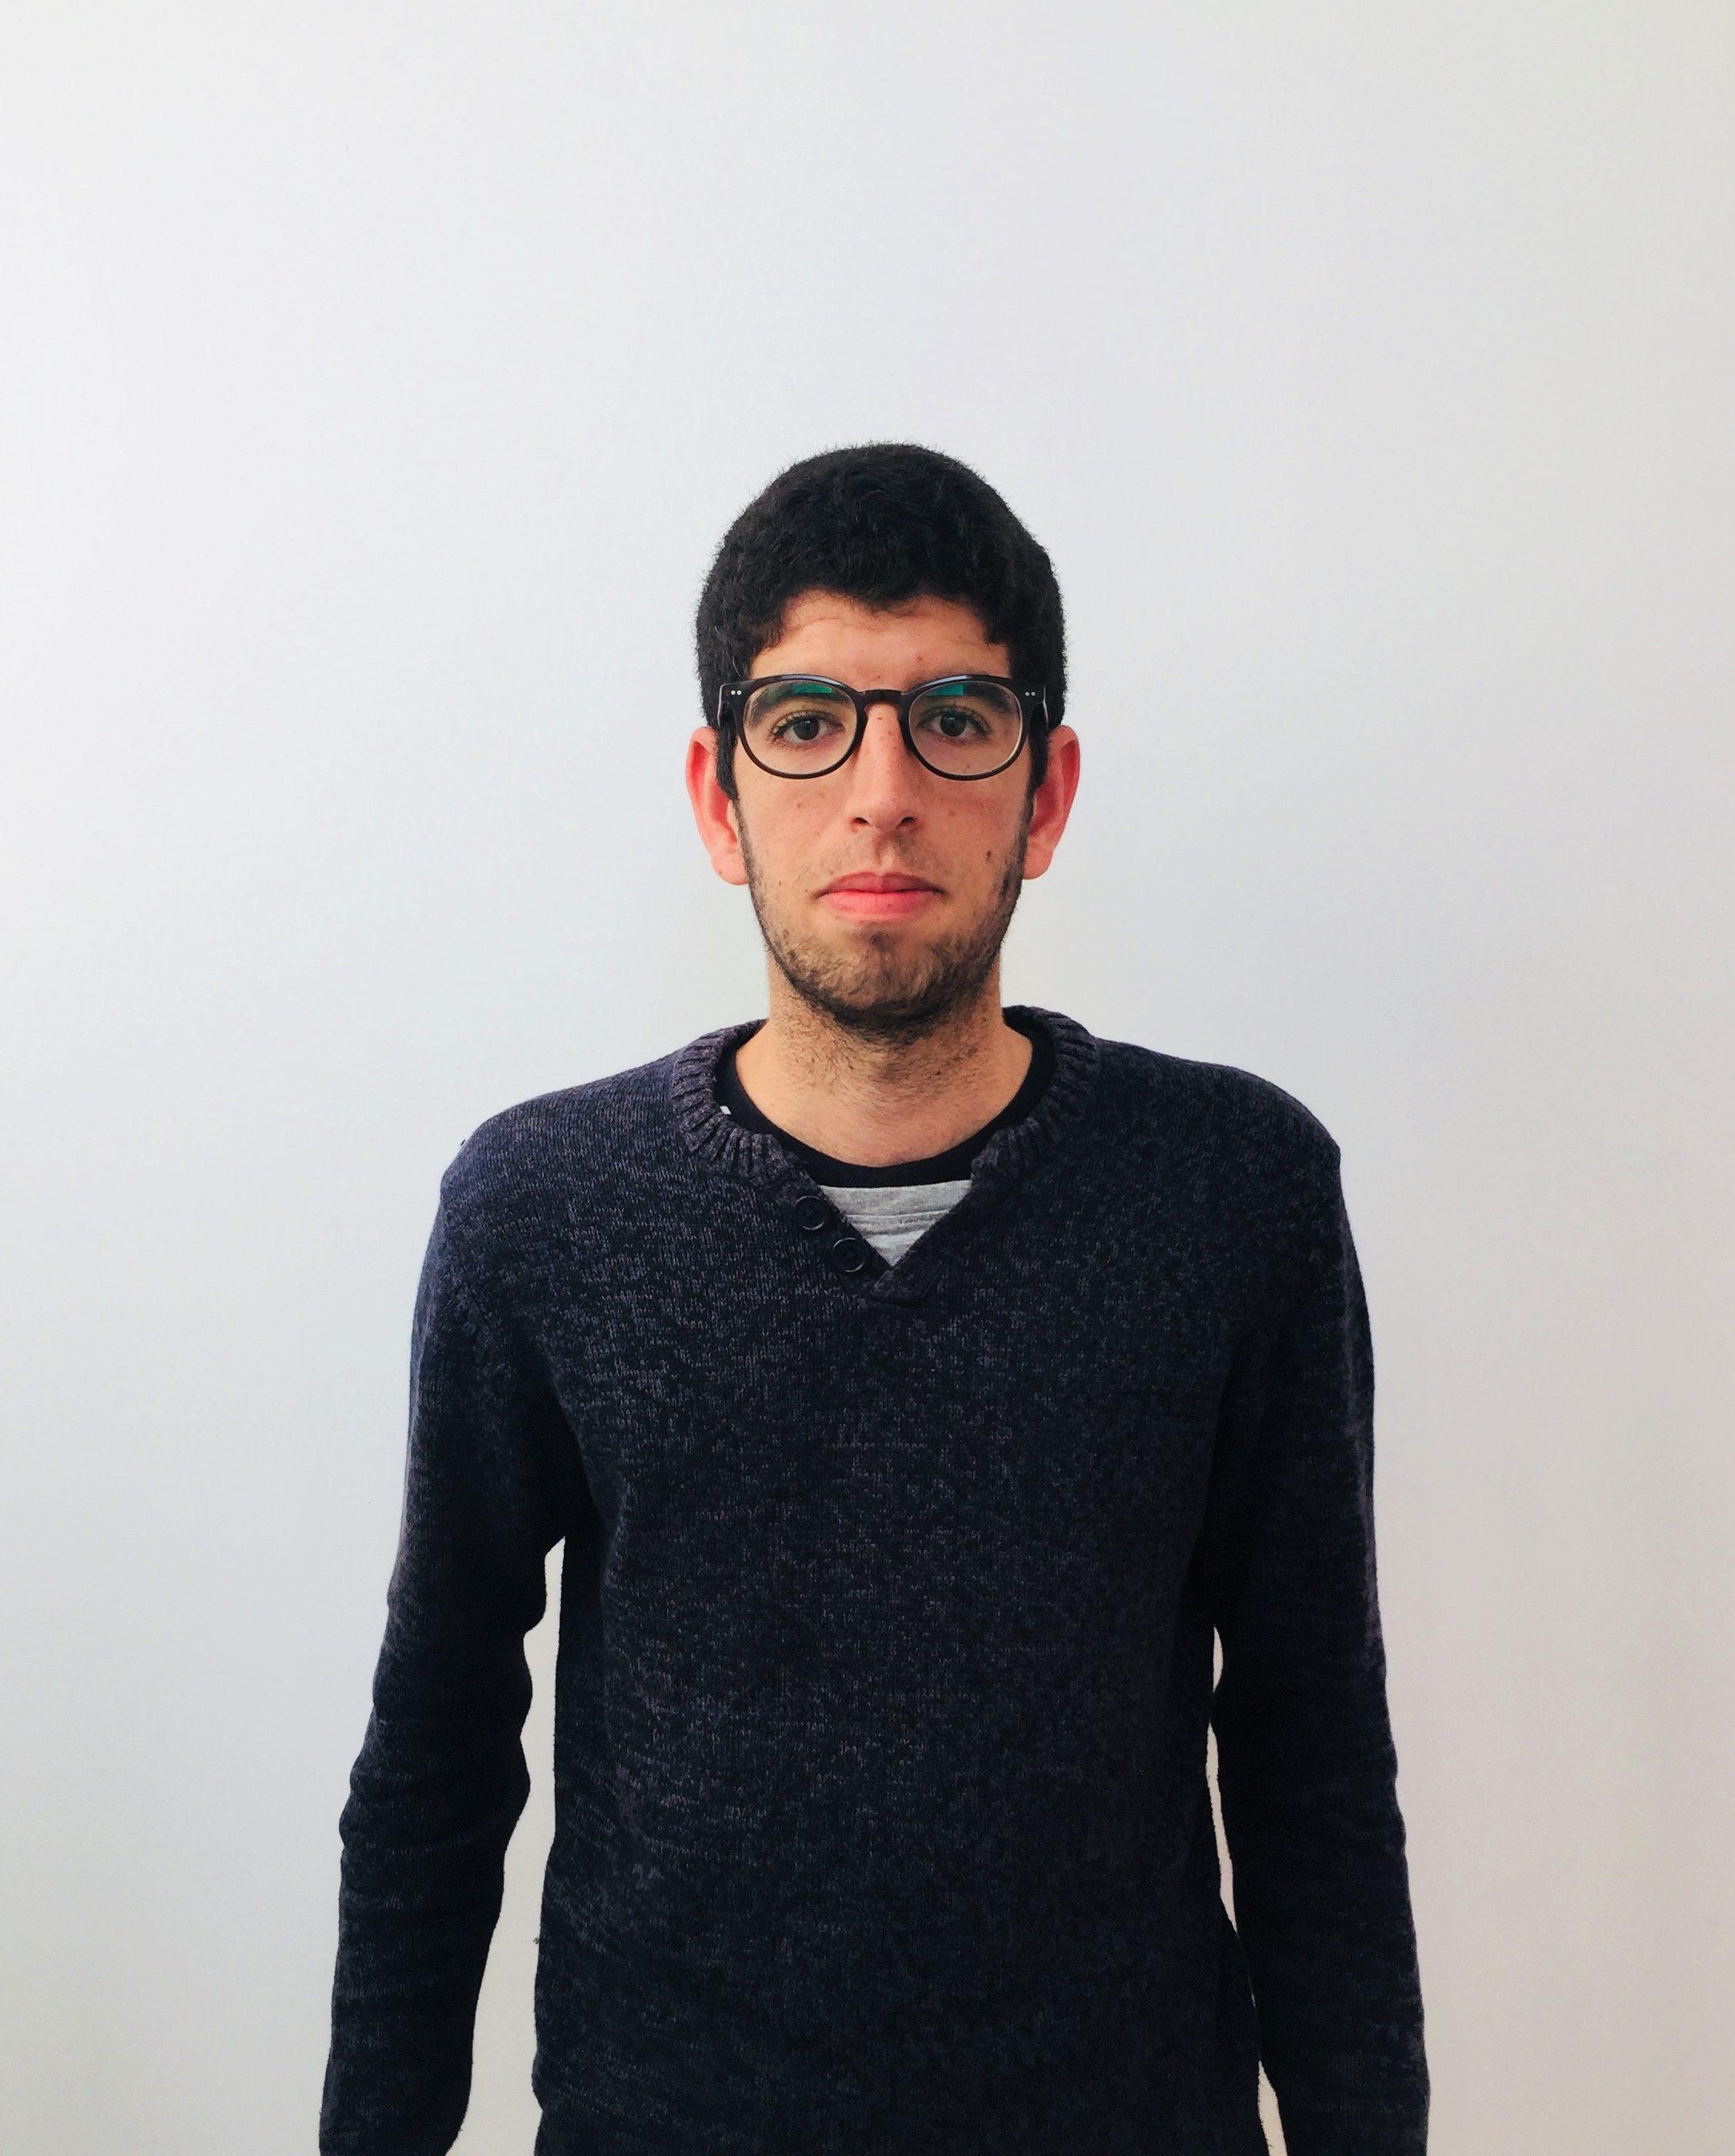 Soufian El Allaoui